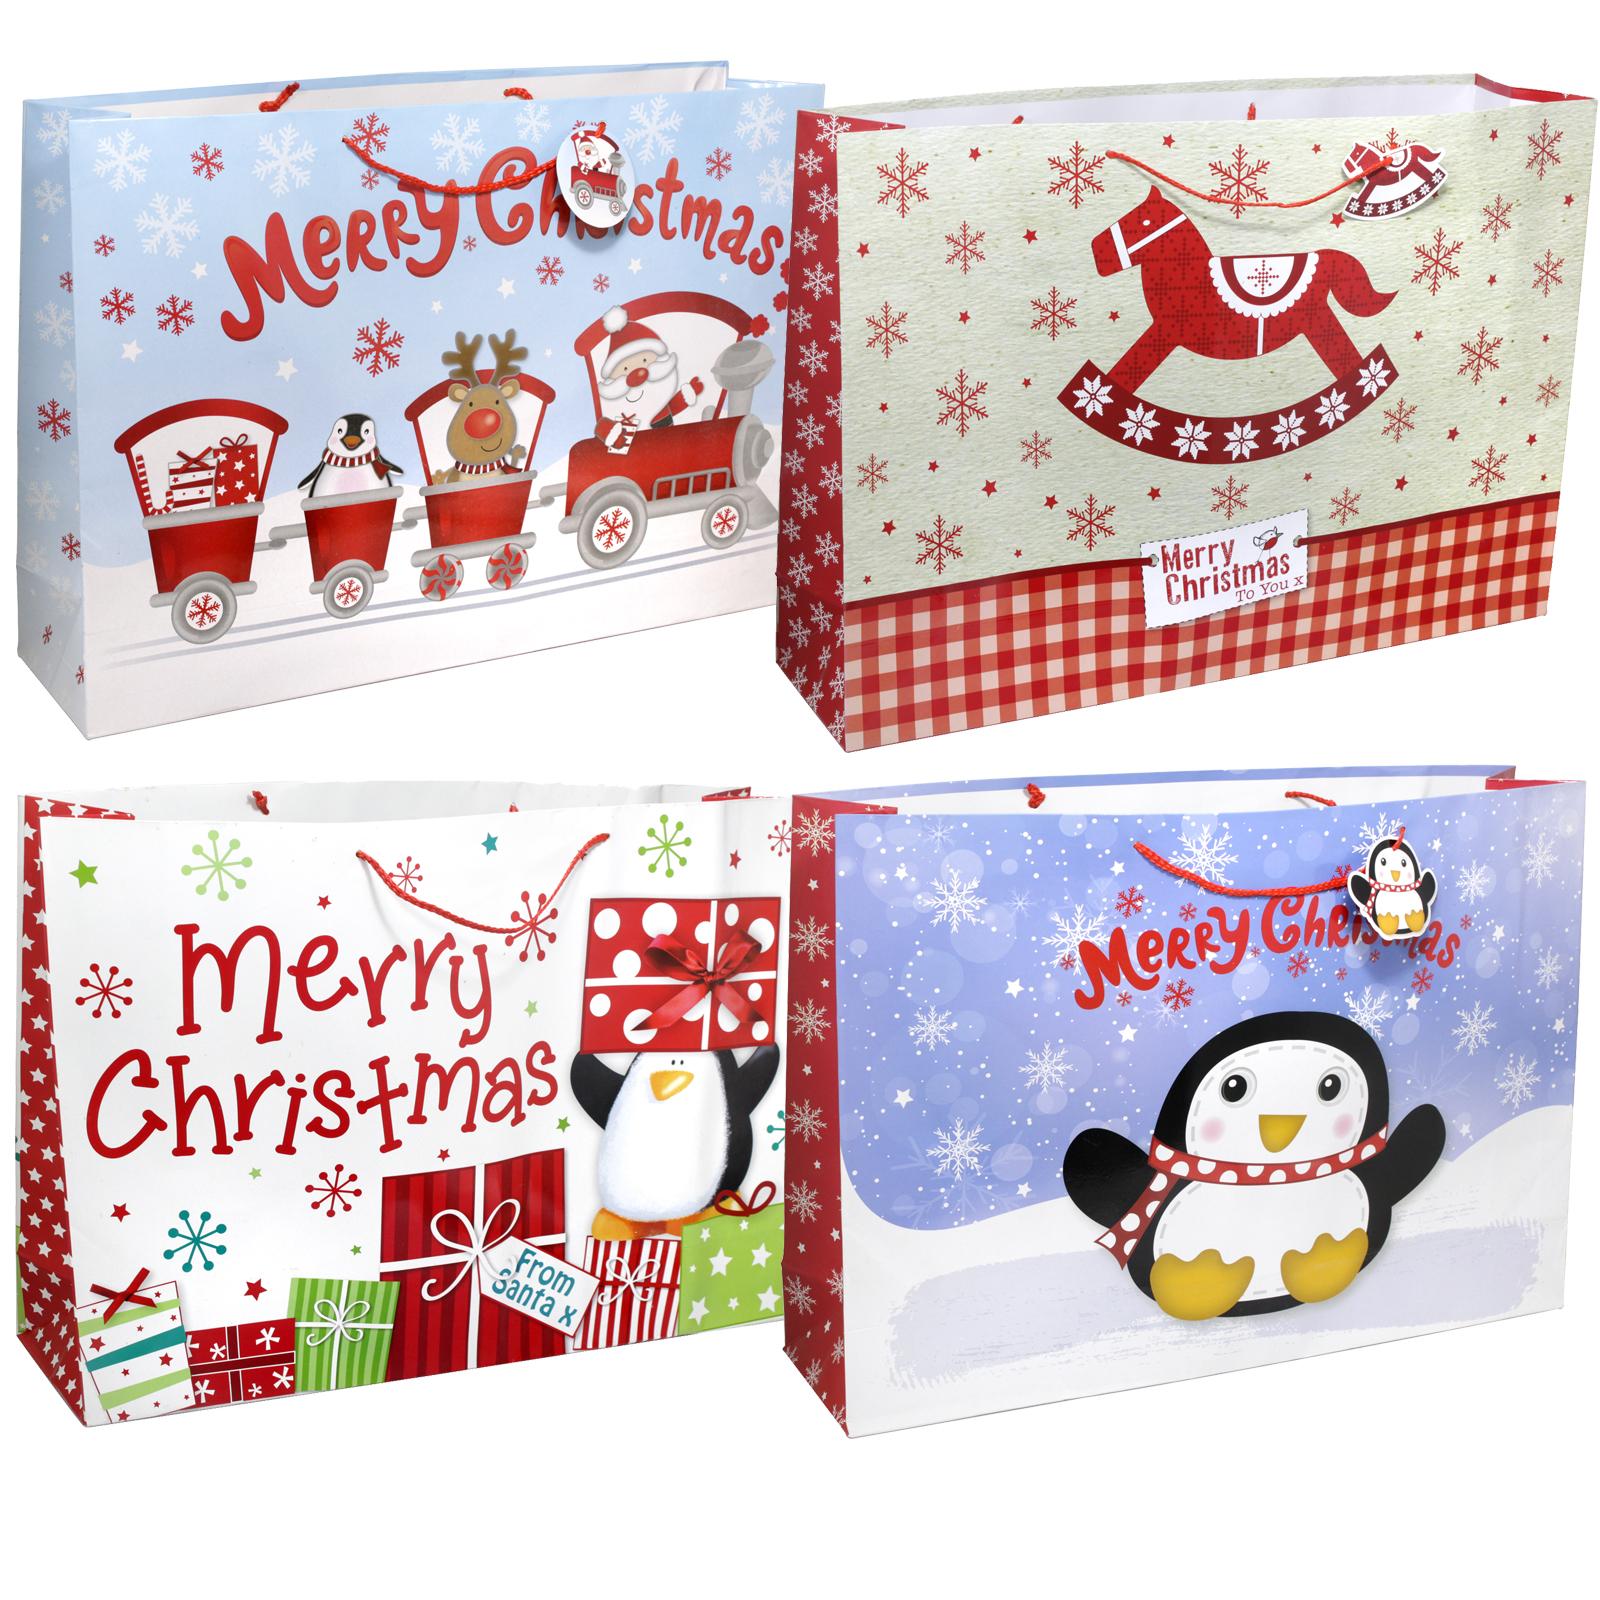 CHRISTMAS GIFT BAG GIANT LANDSCAPE 4 ASSORTED DESIGNS